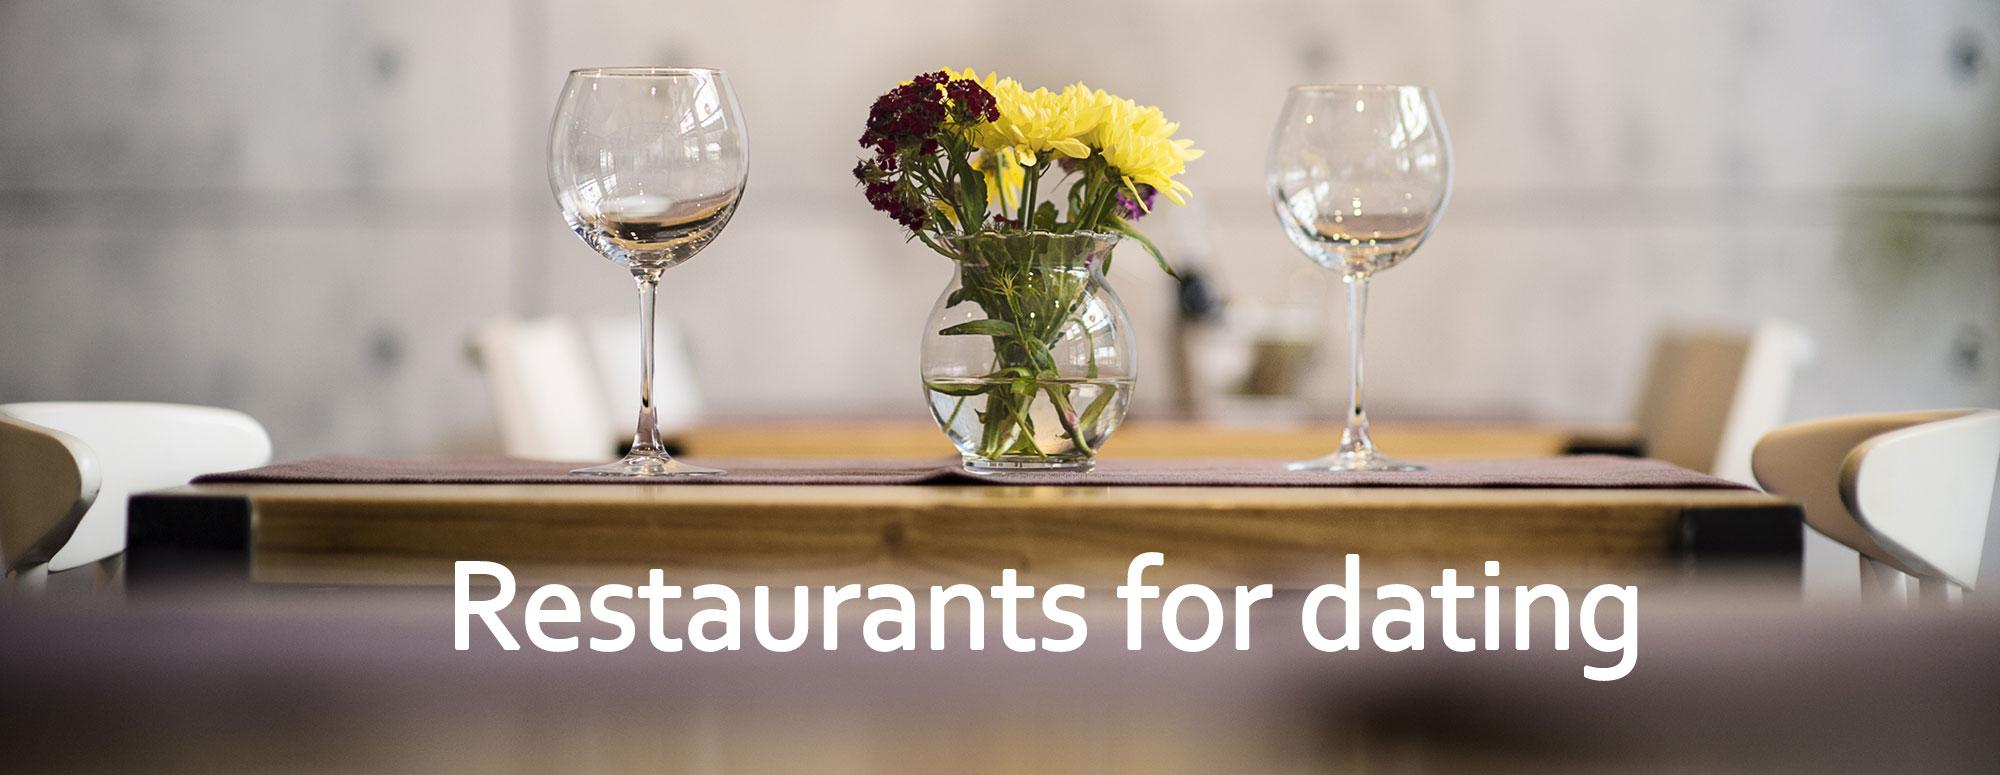 Restaurants for dating table for two flowers glasses